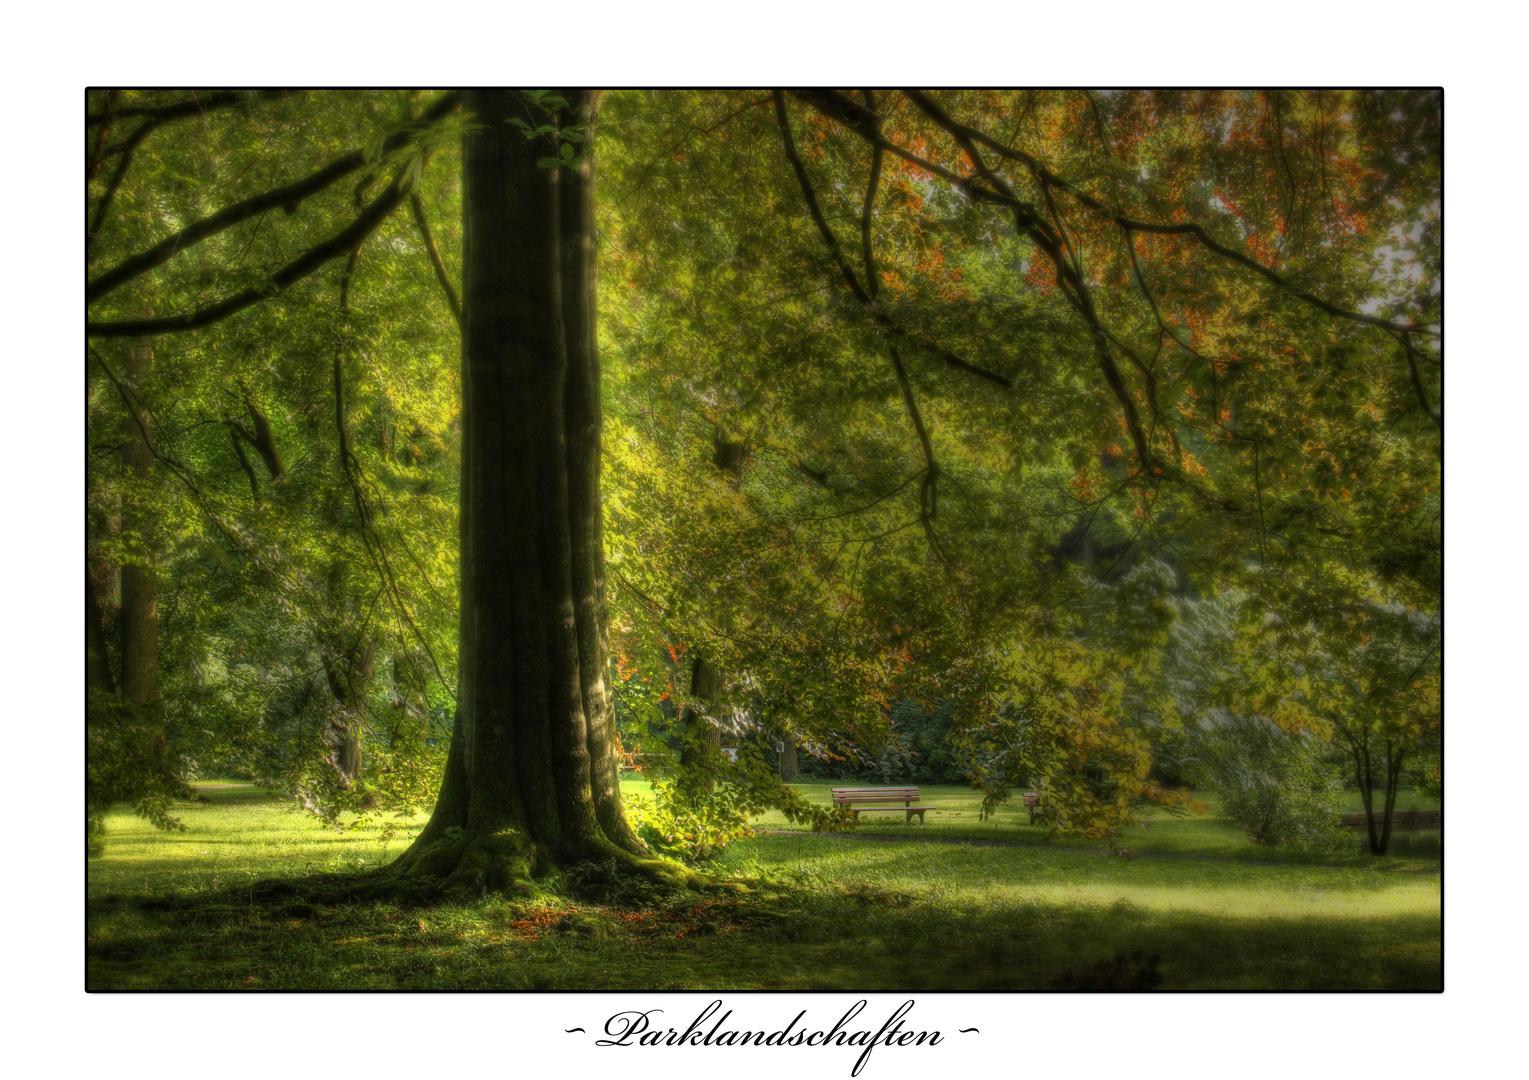 ~ Parklandschaft ~